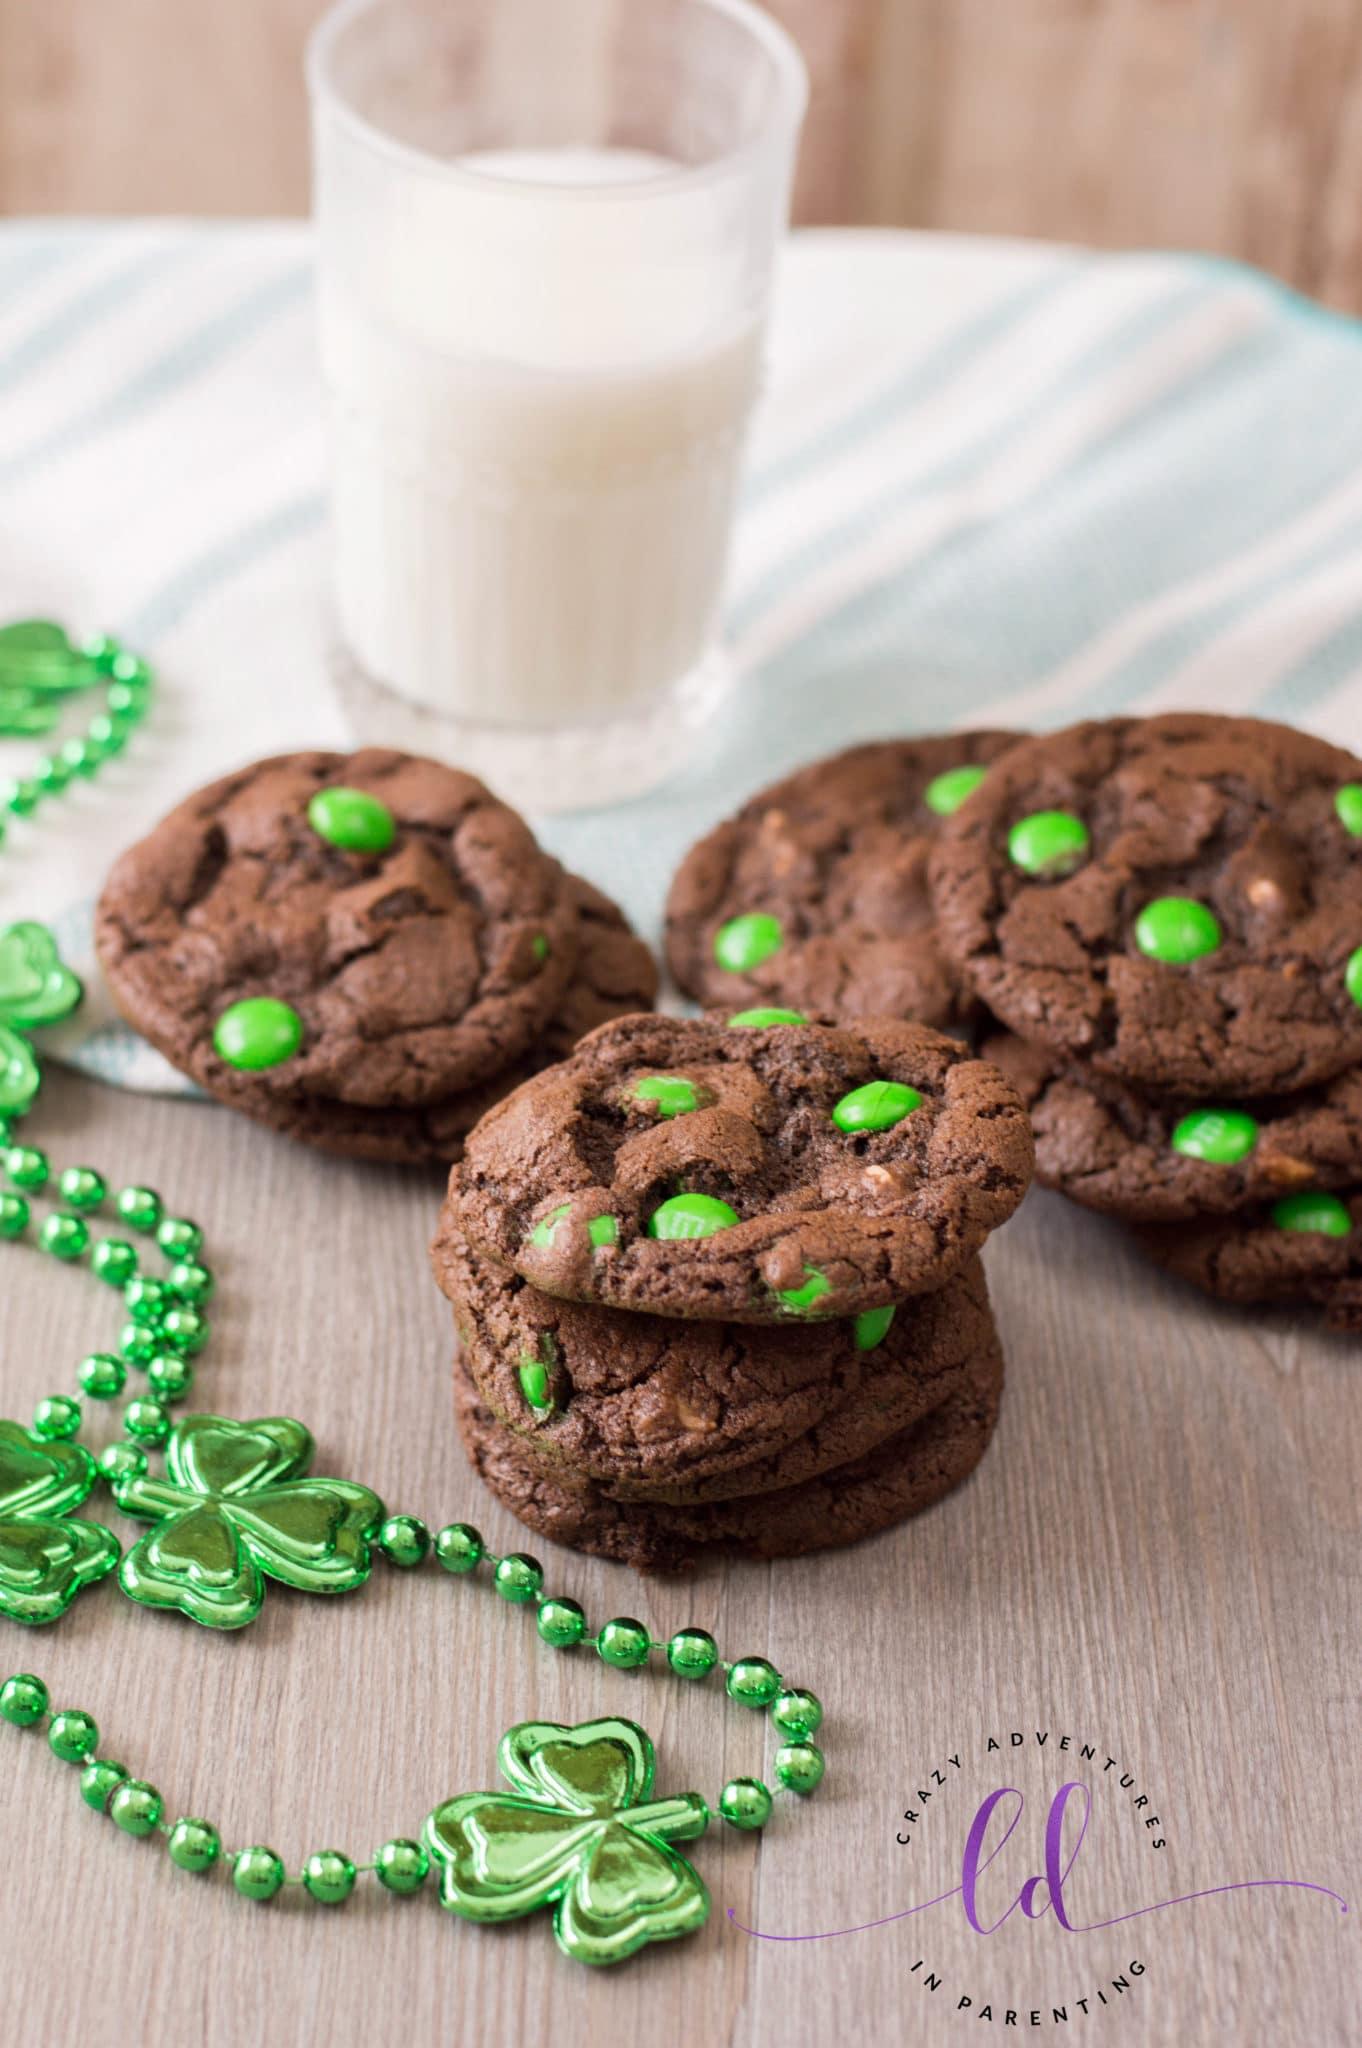 St Patricks Day Chocolate Cookies Recipe